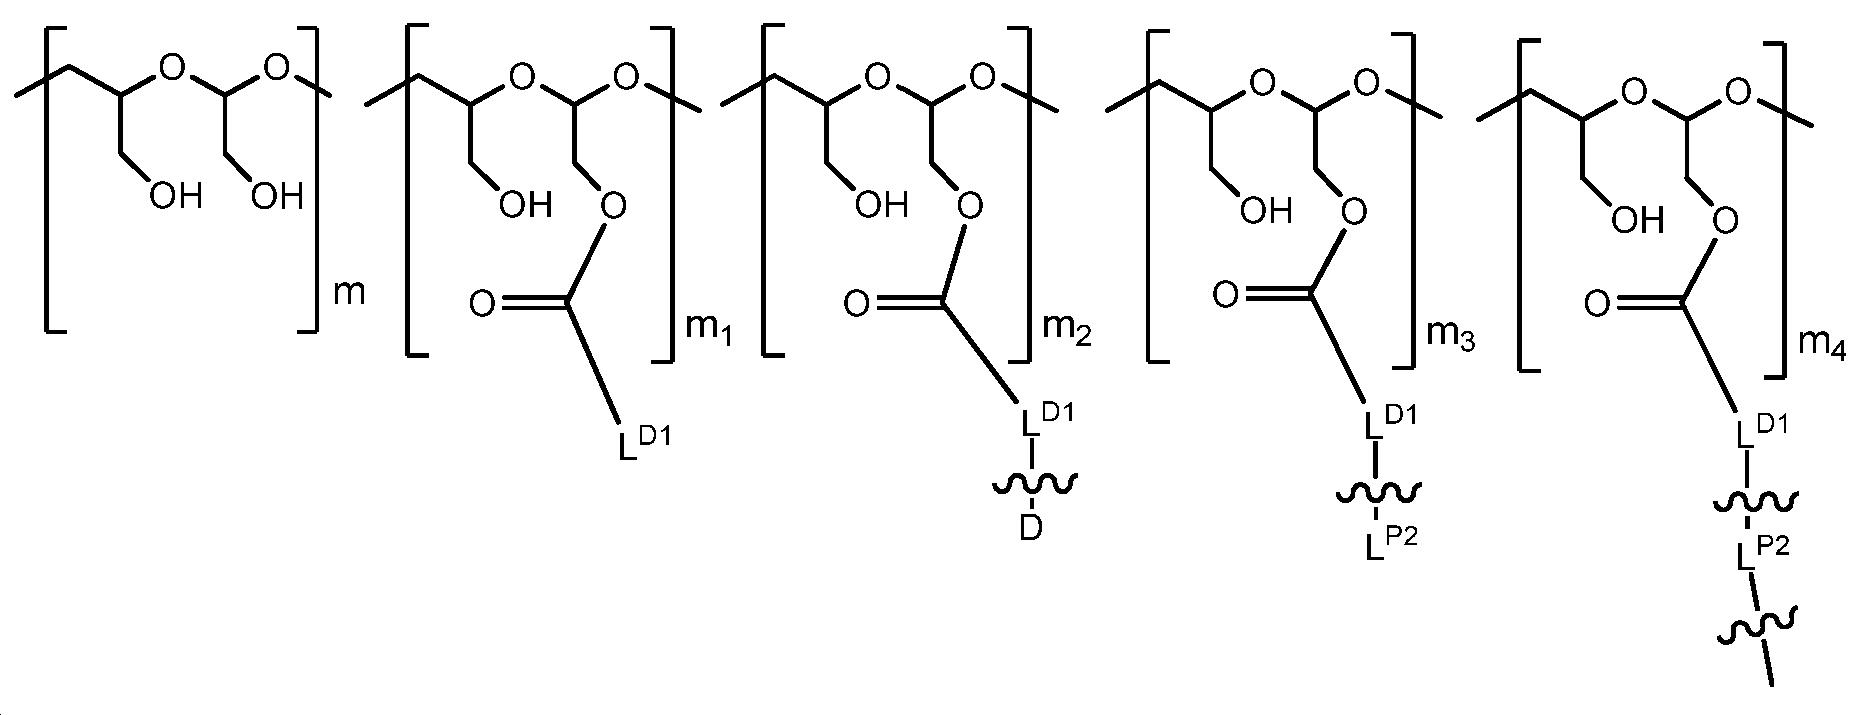 Figure 112014001971018-pct00008